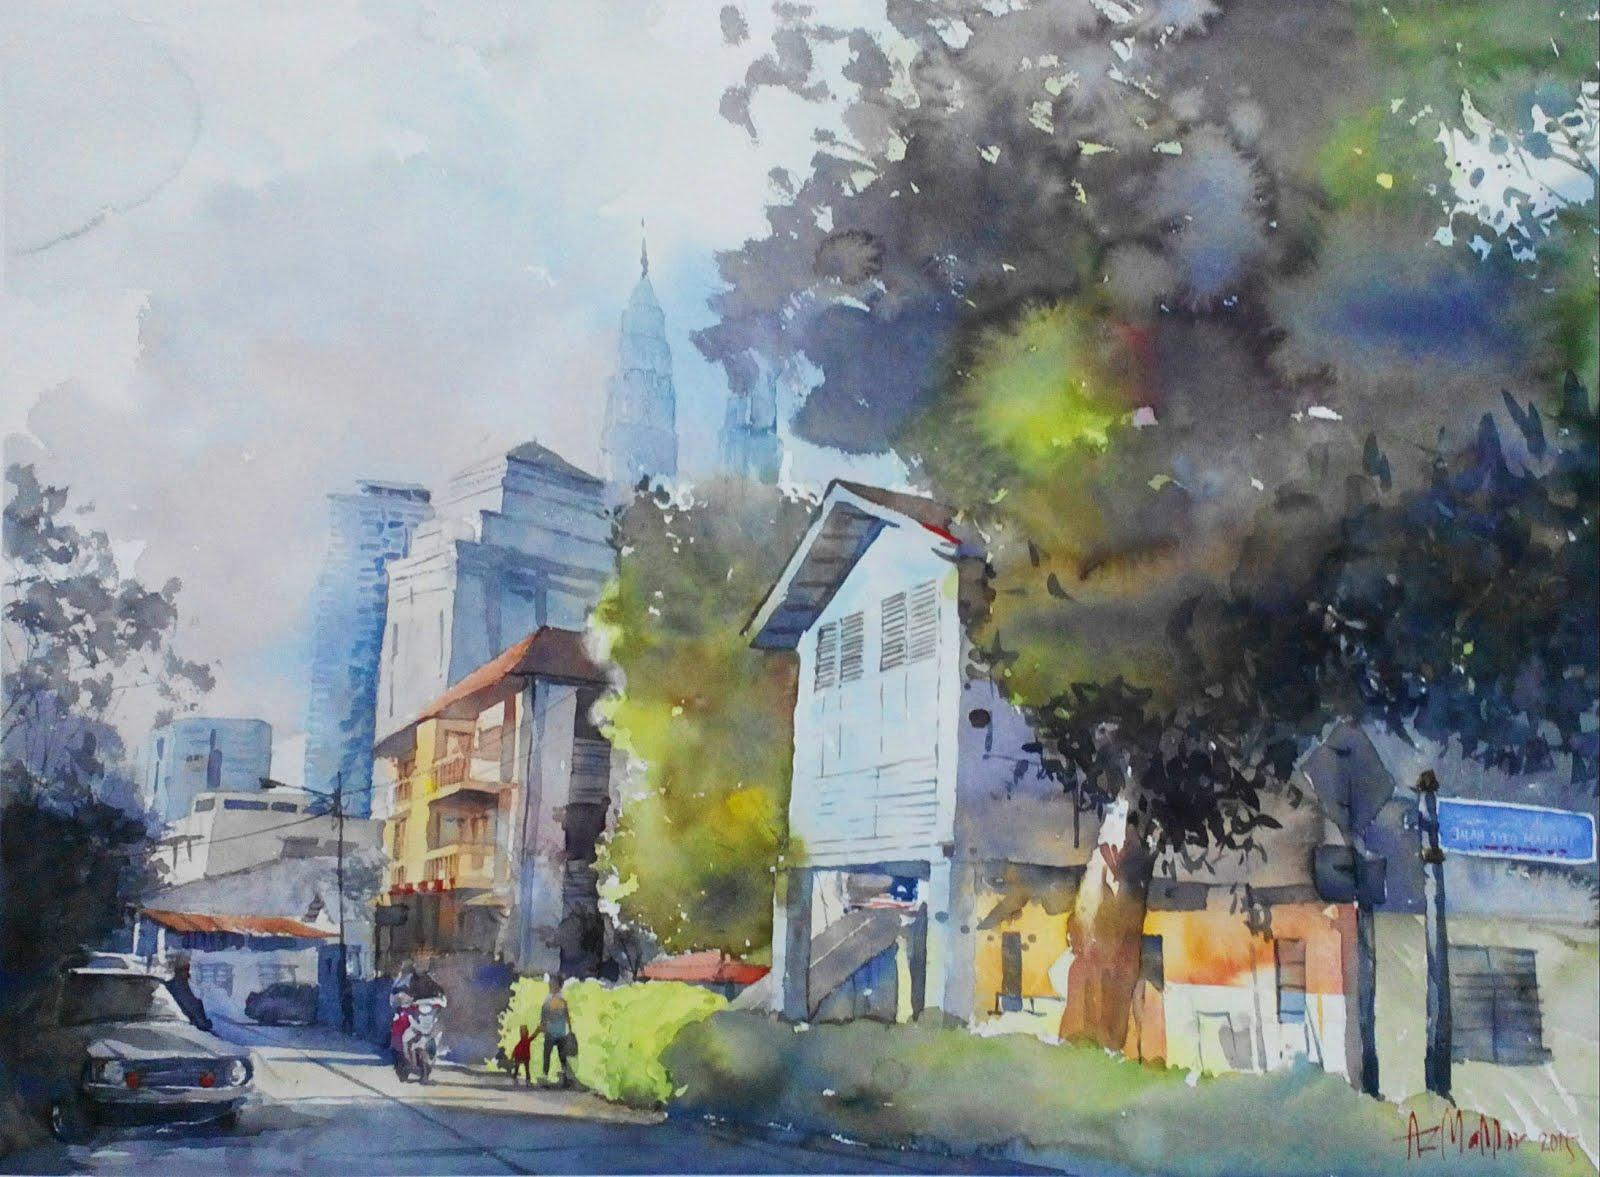 Watercolor: Sinar Kg. Baru (Lorong Haji Yaakob)